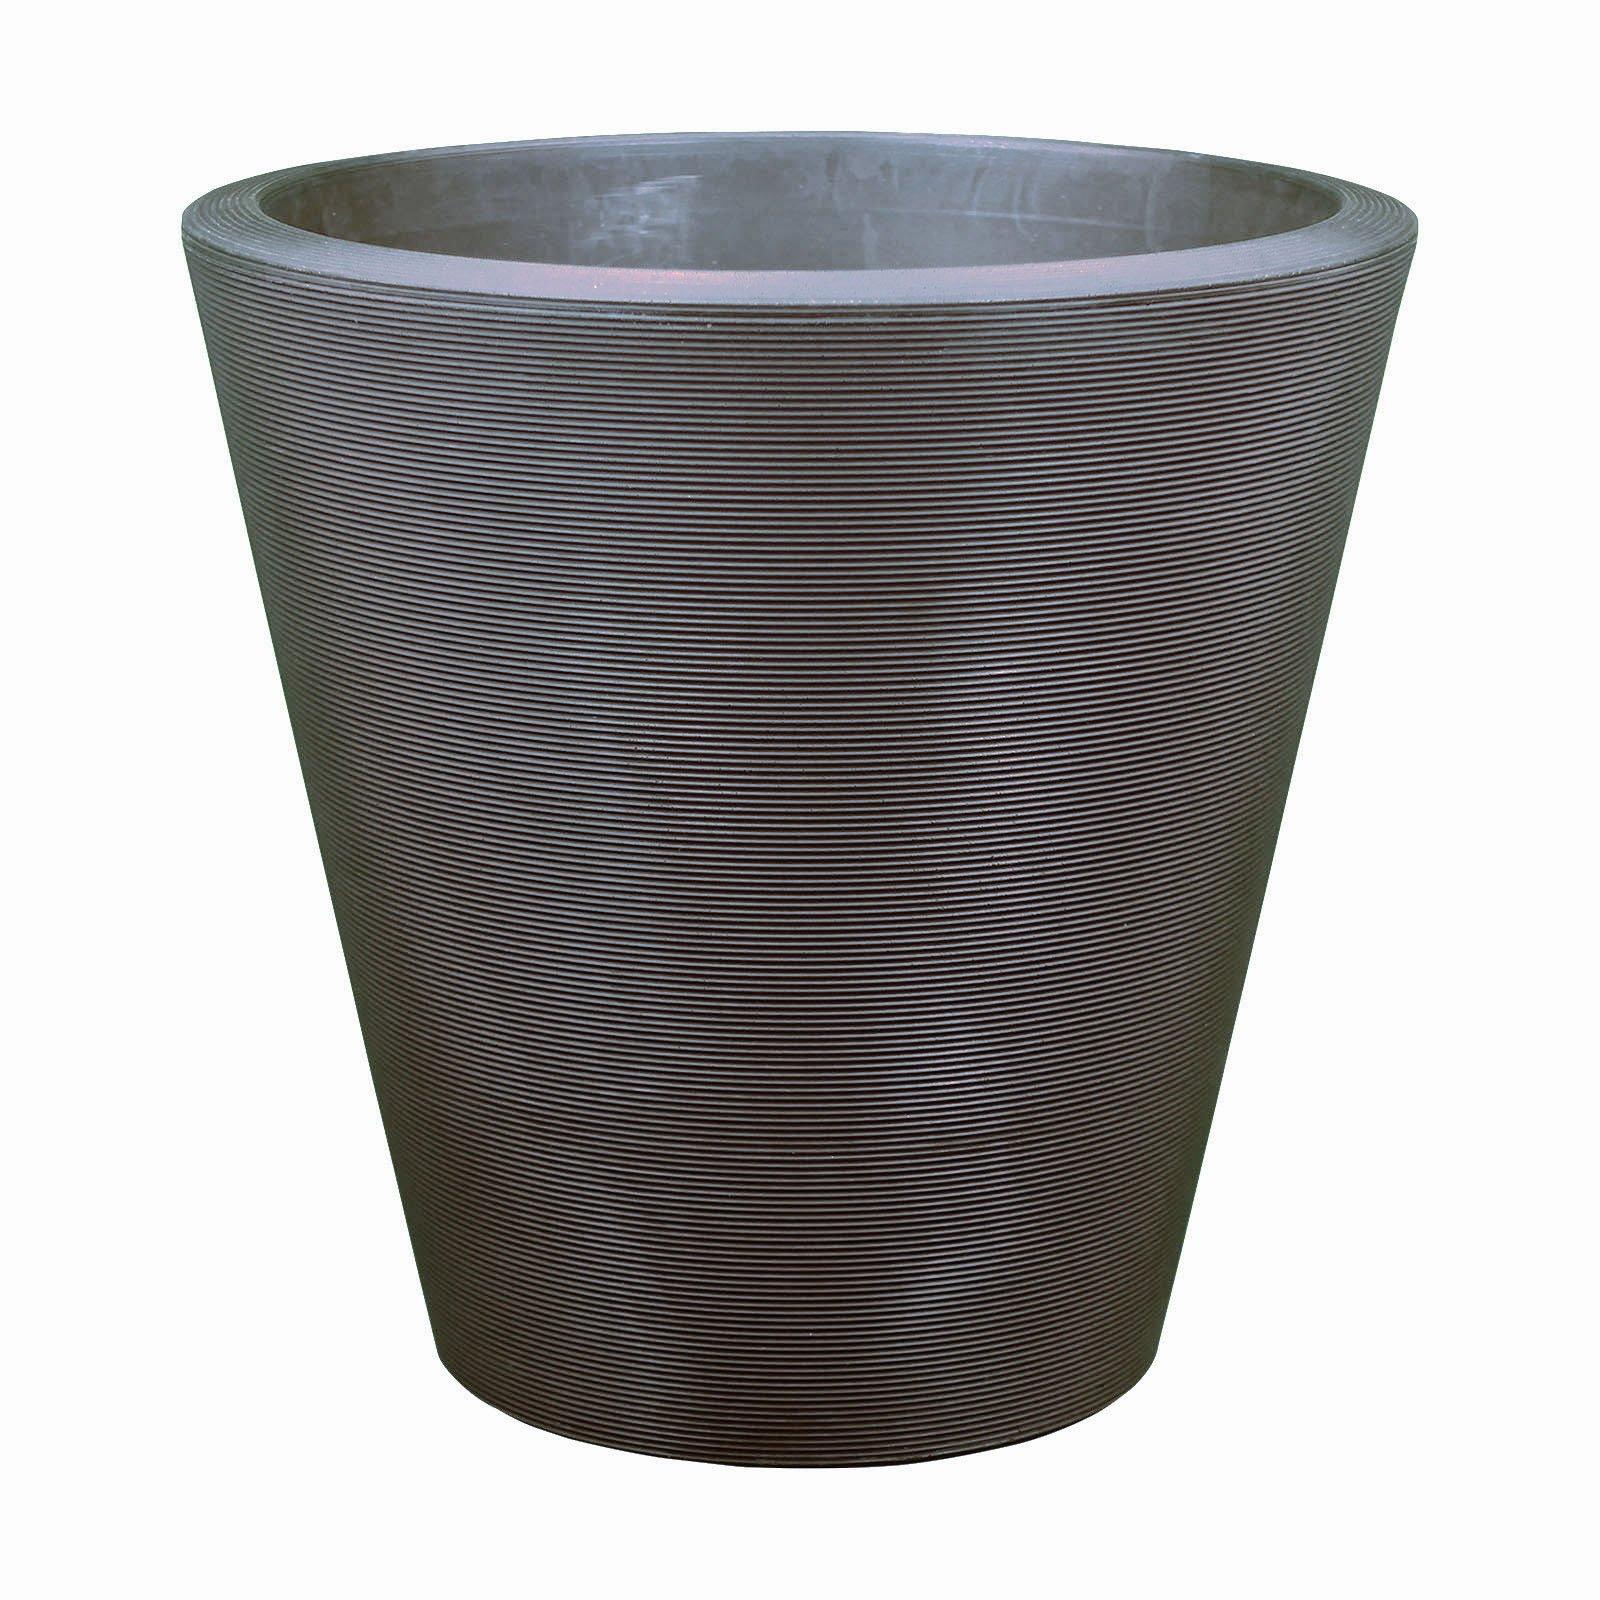 Large Outdoor Planters - Plastic - 14'/16'/20'/26'/34' Diameters